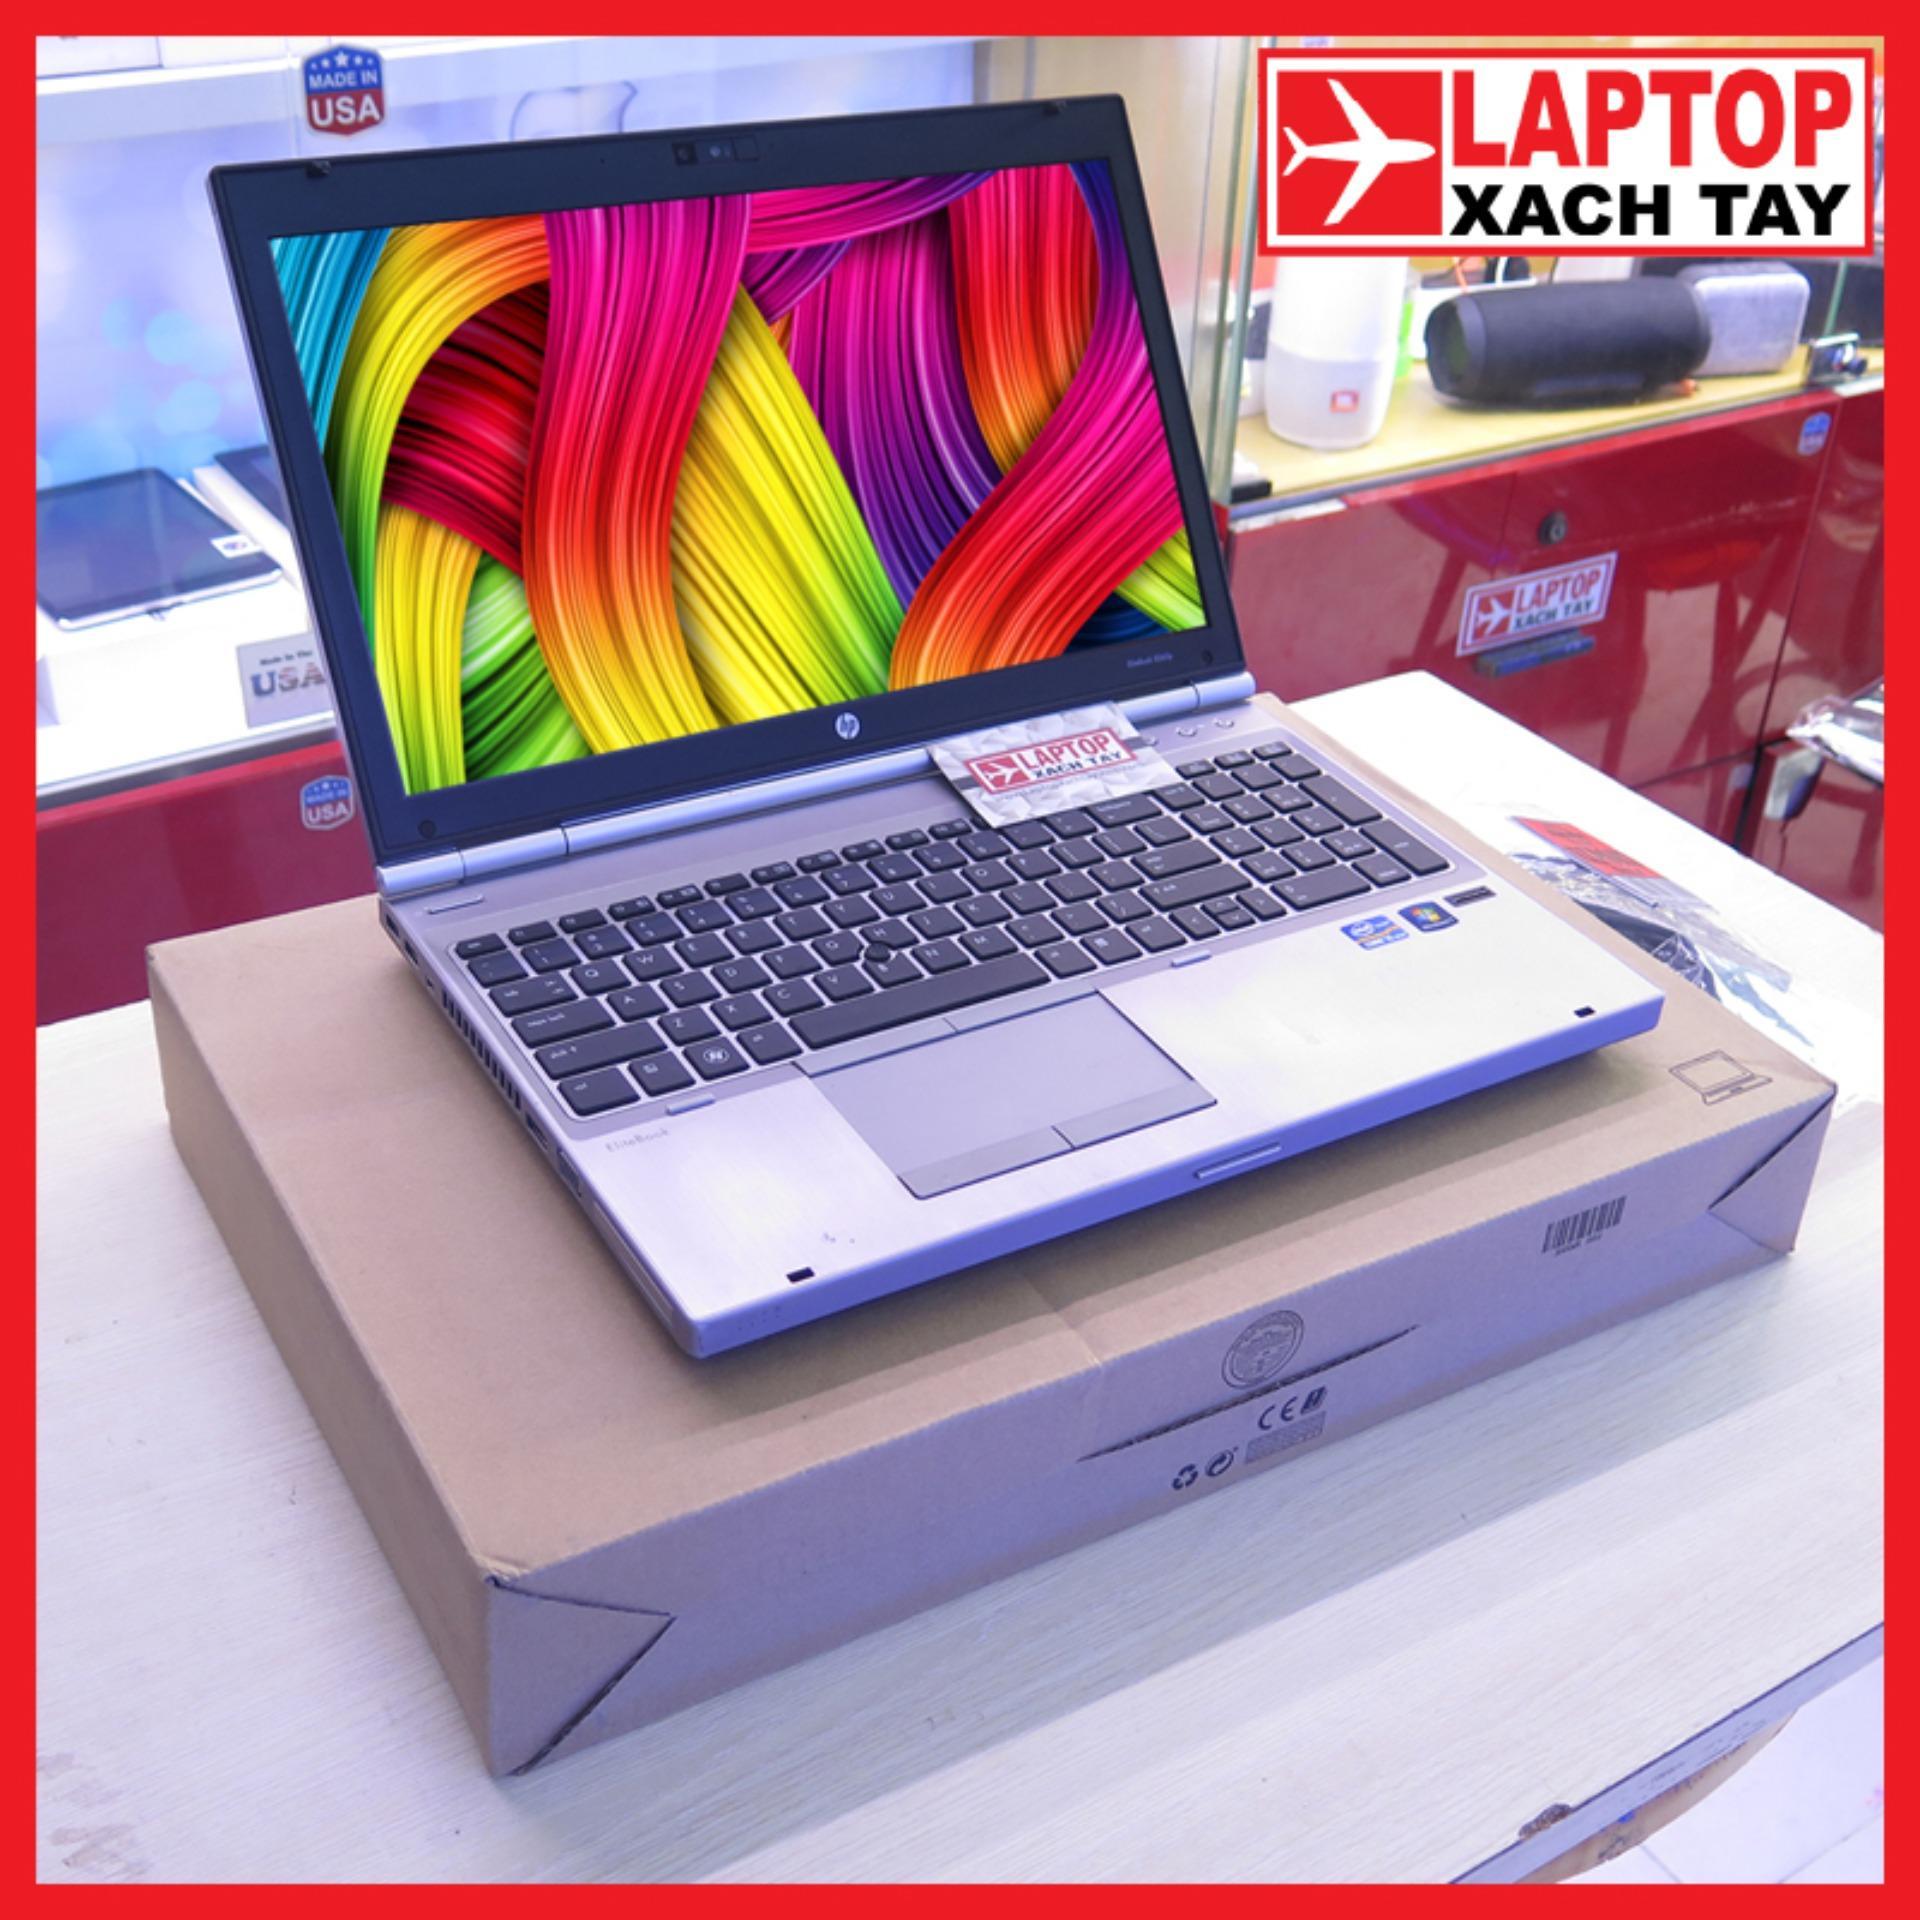 Laptop HP Elitebook 8560P i7/4/1TB/VGA - Laptopxachtayshop